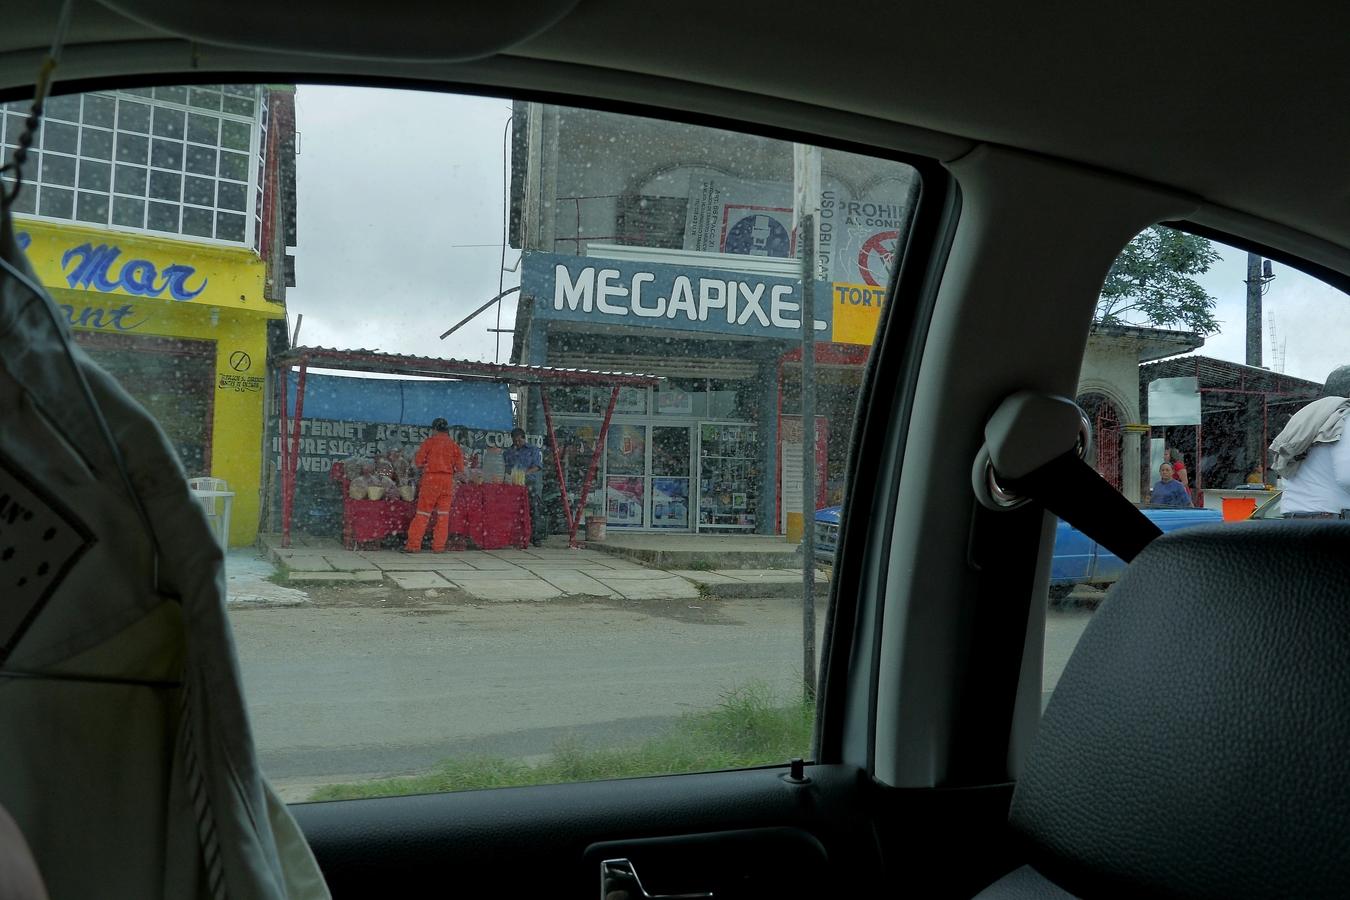 Megapixel po mexicku